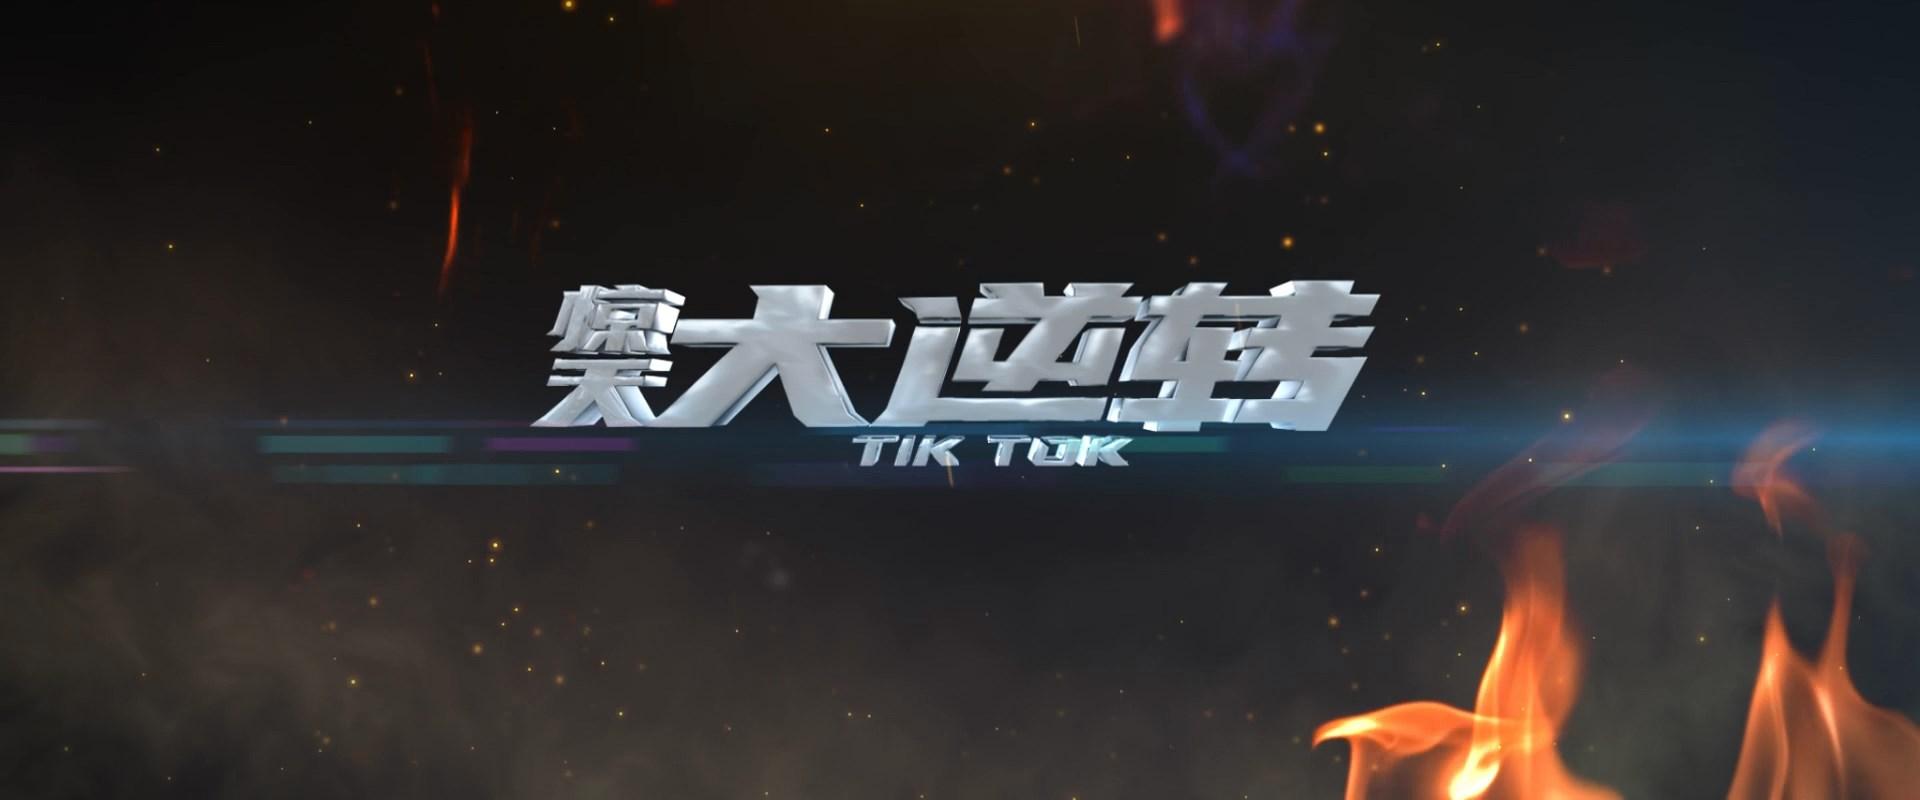 Tik Tok (2016) 1080p WEB-DL AMZN Latino